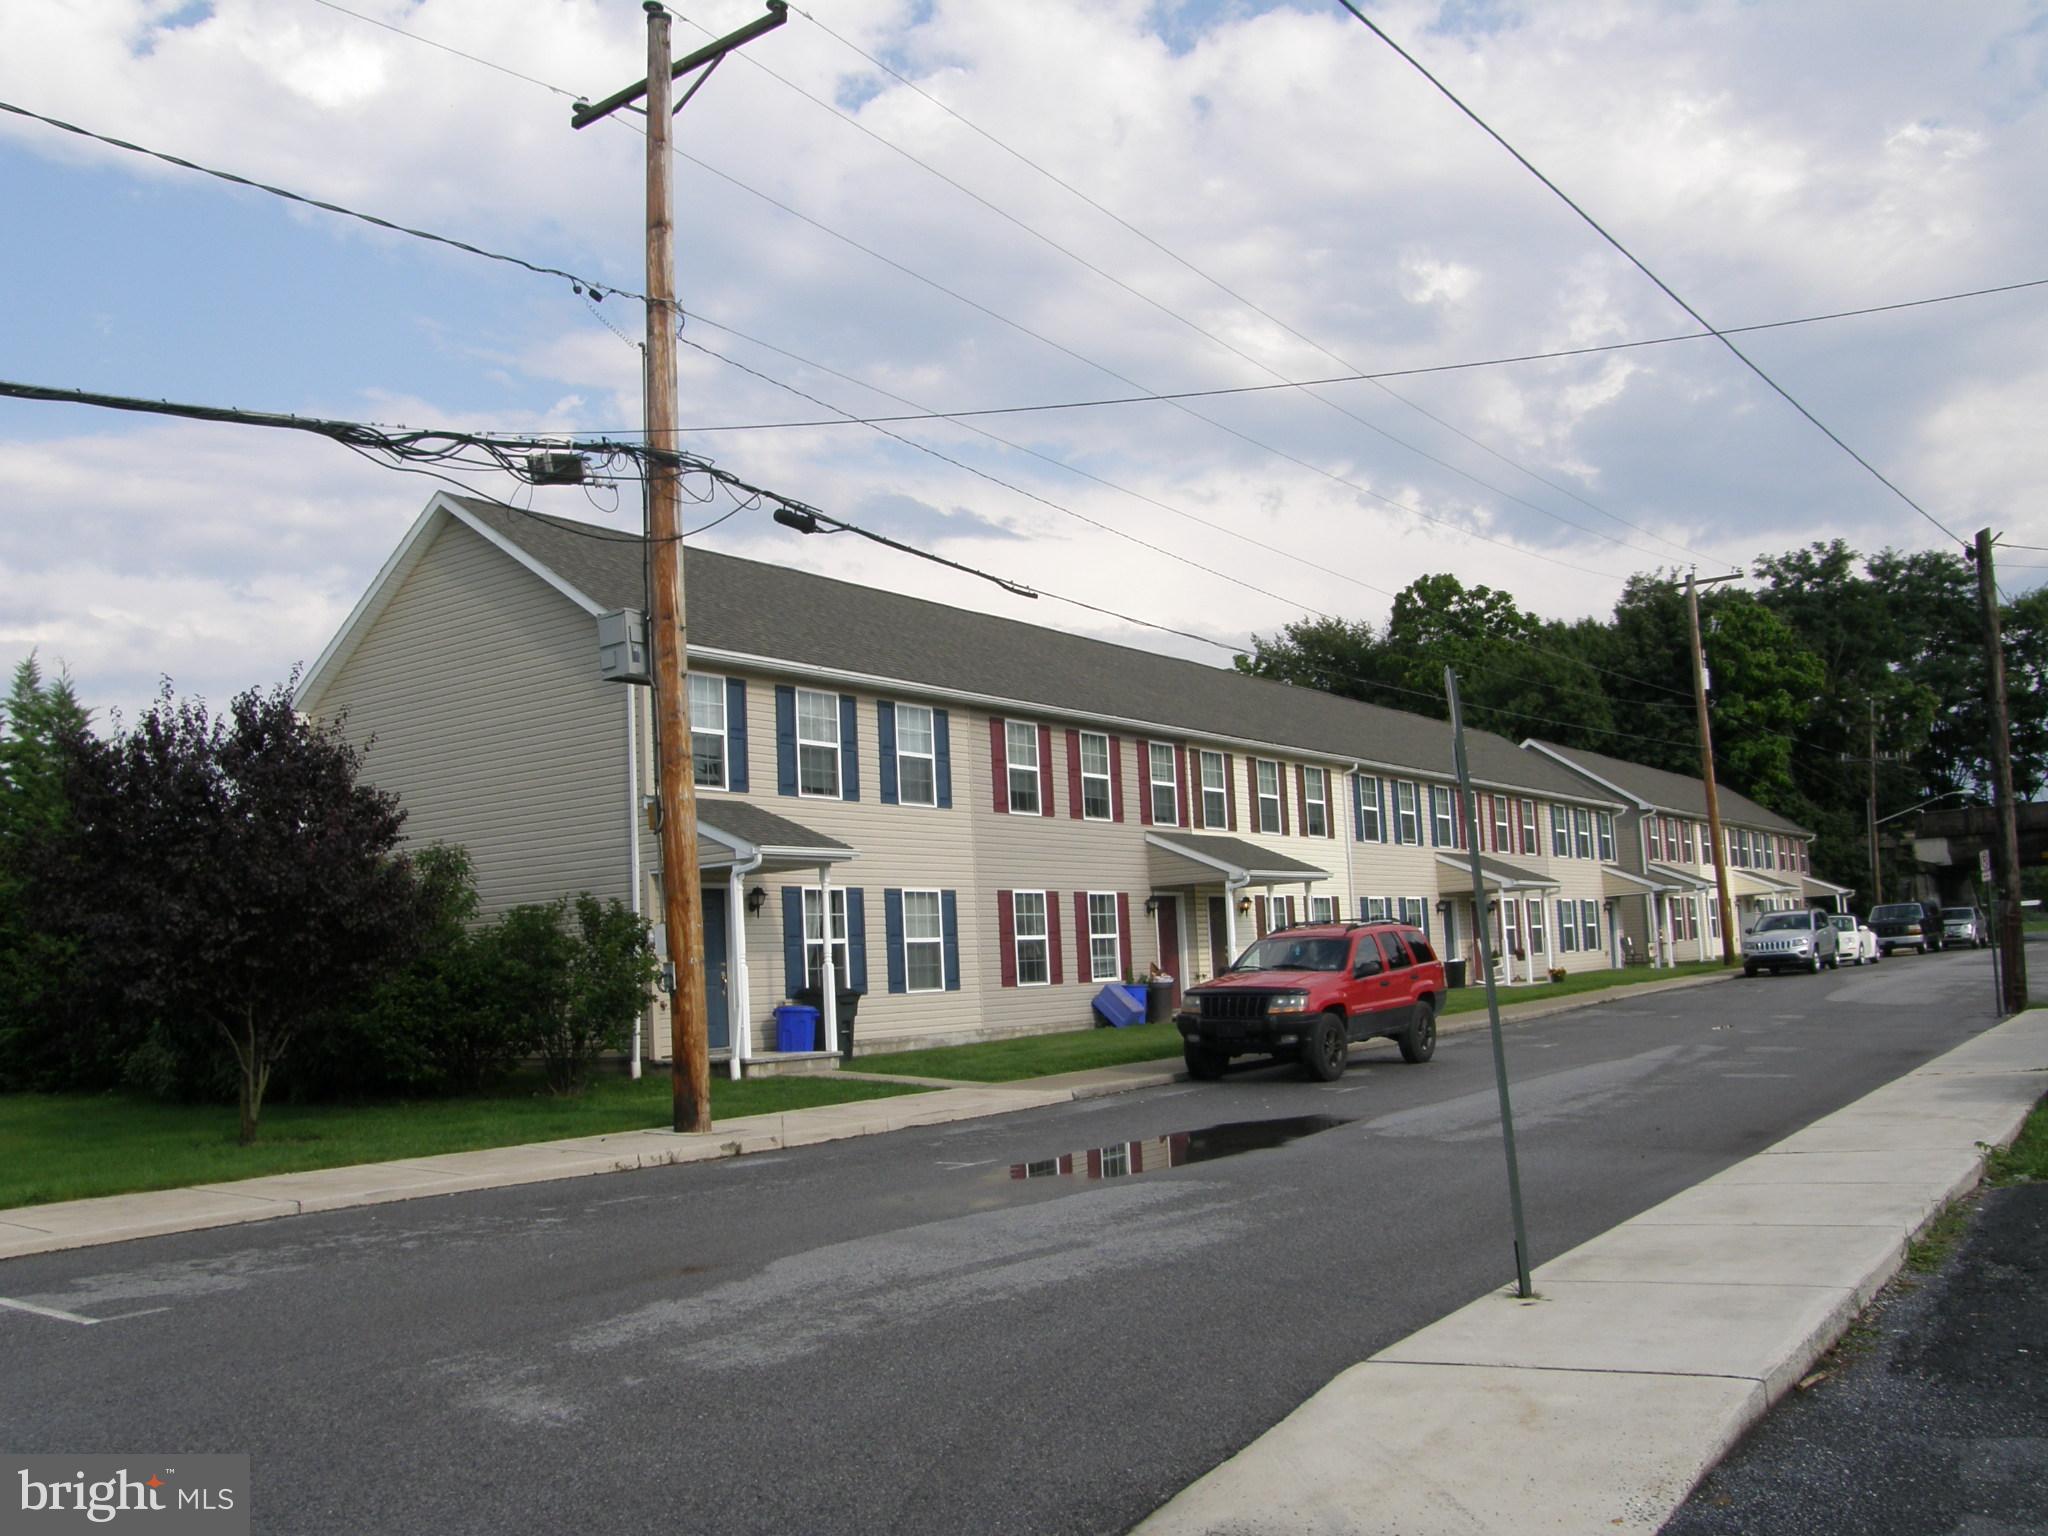 121 SENECA - EARL STREET S, SHIPPENSBURG, PA 17257